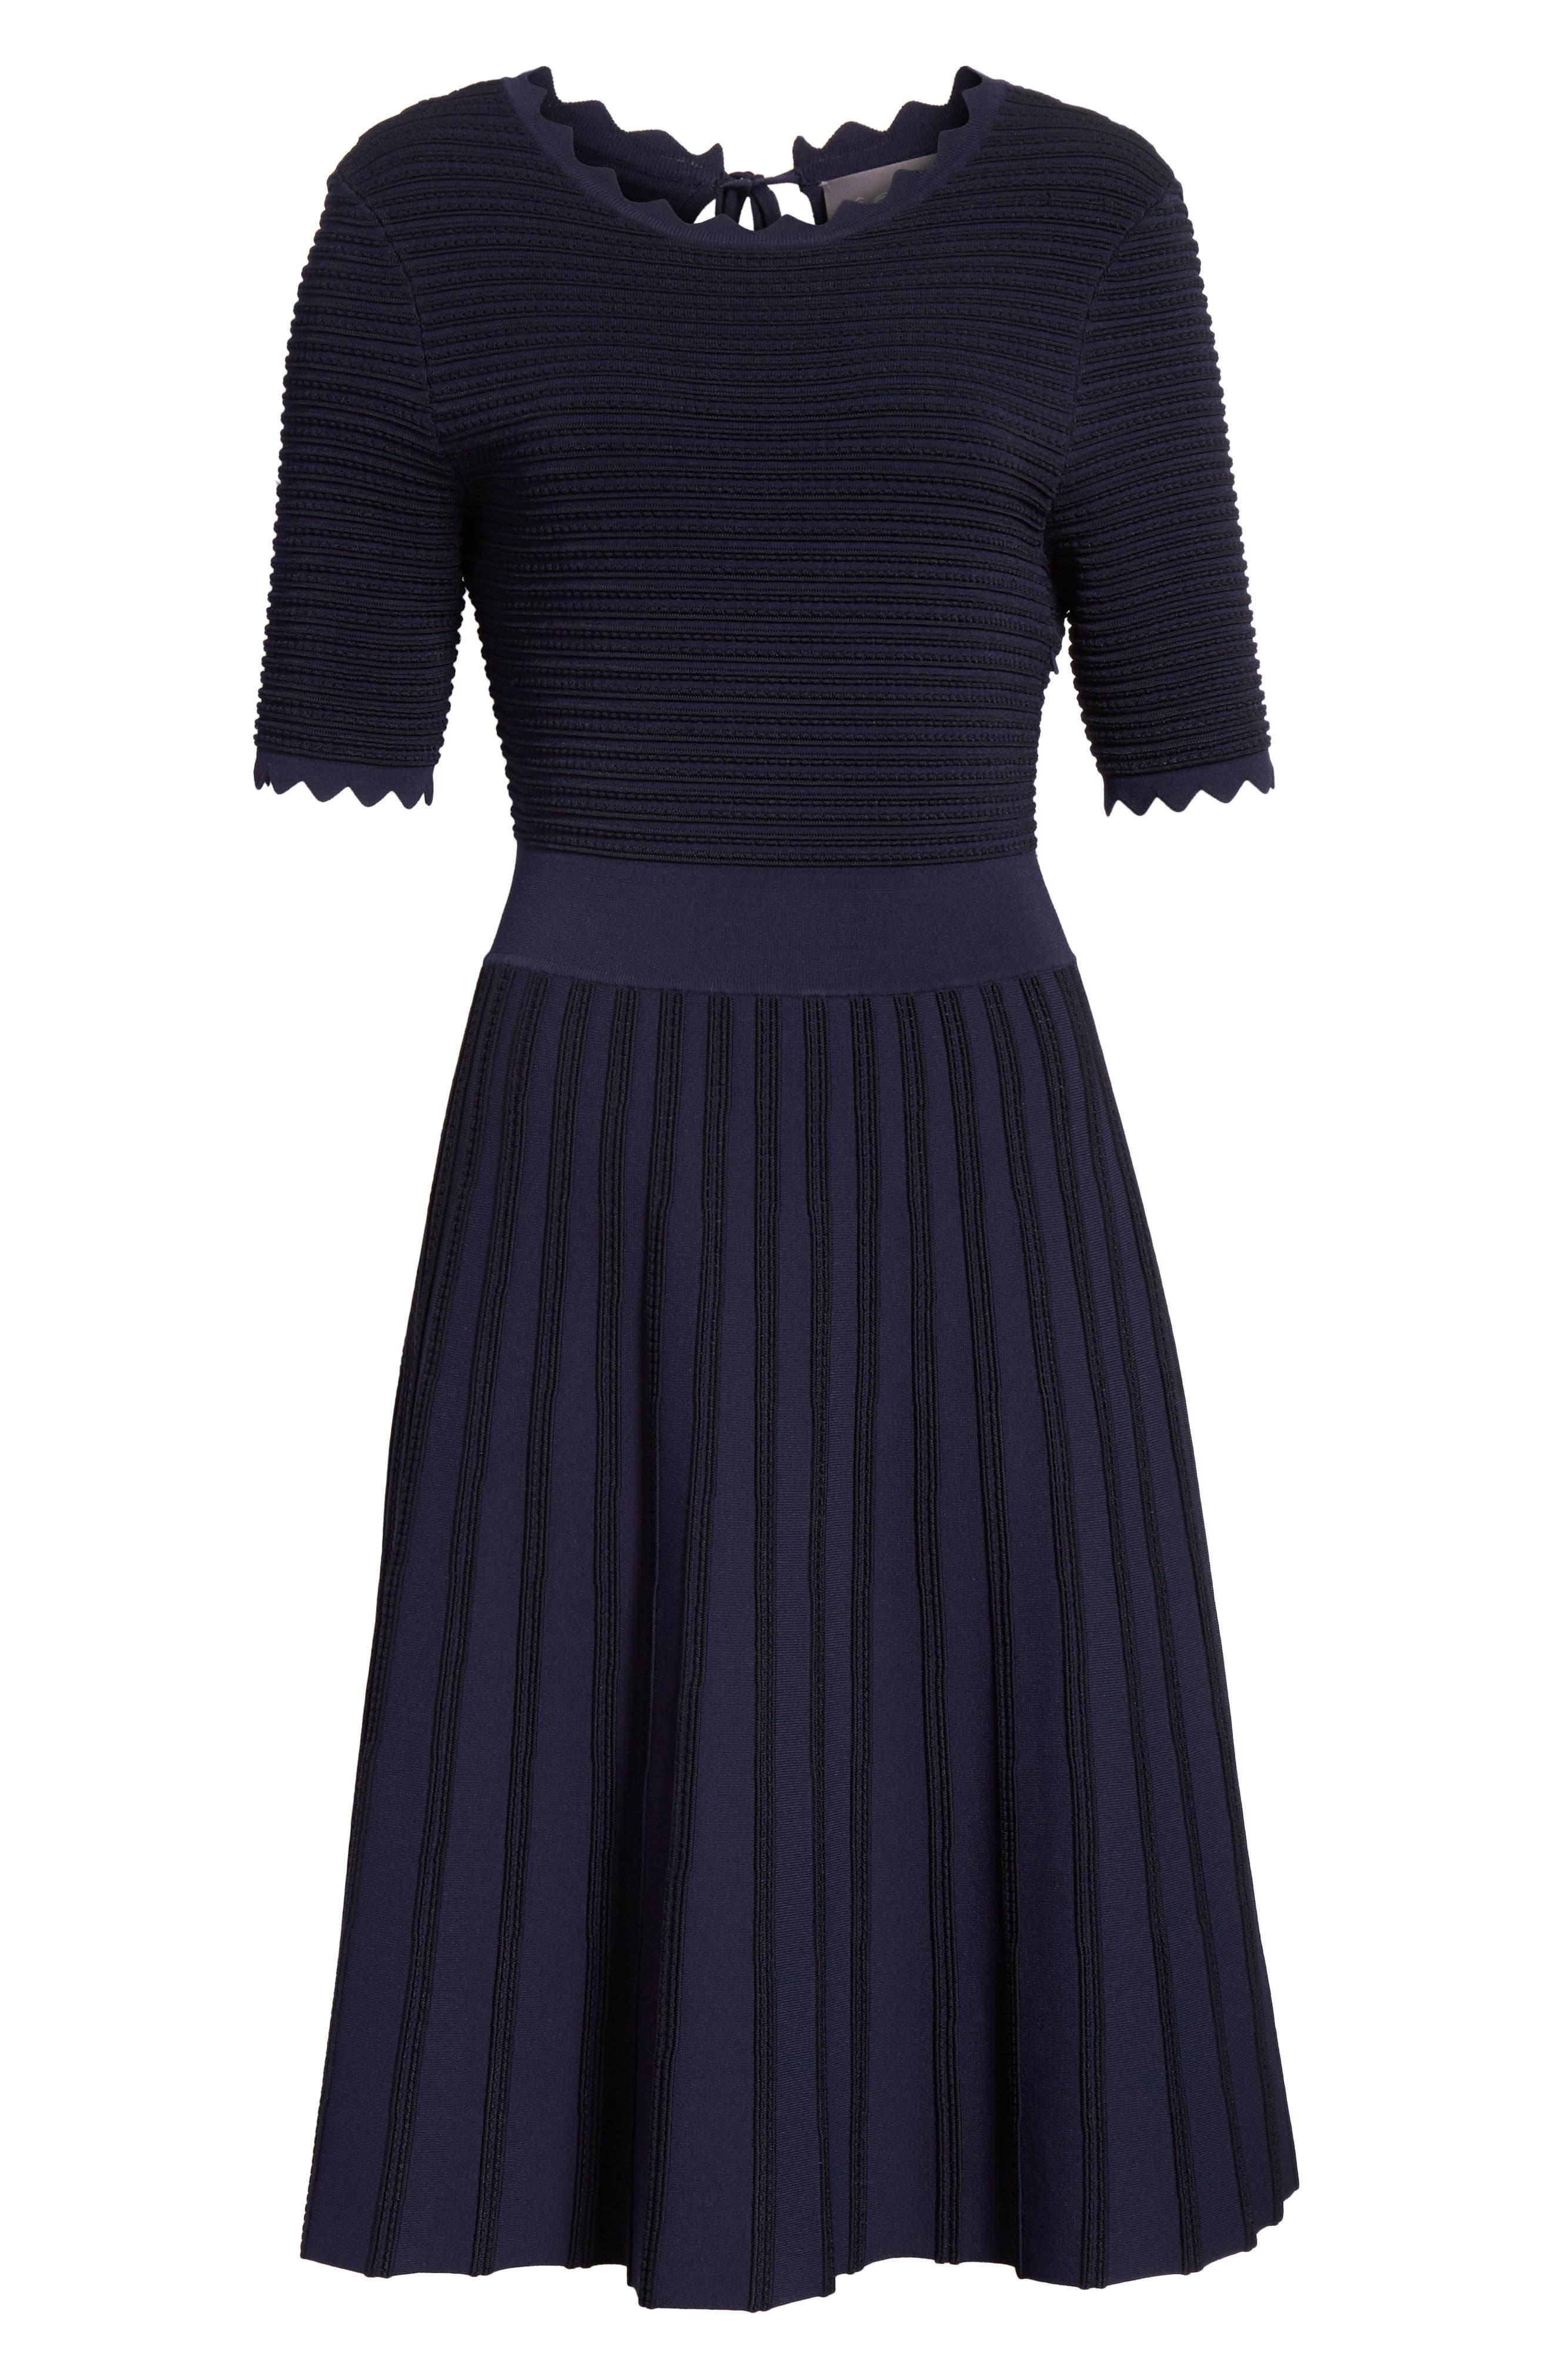 Scallop Trim Stripe Dress,                             Alternate thumbnail 8, color,                             Navy